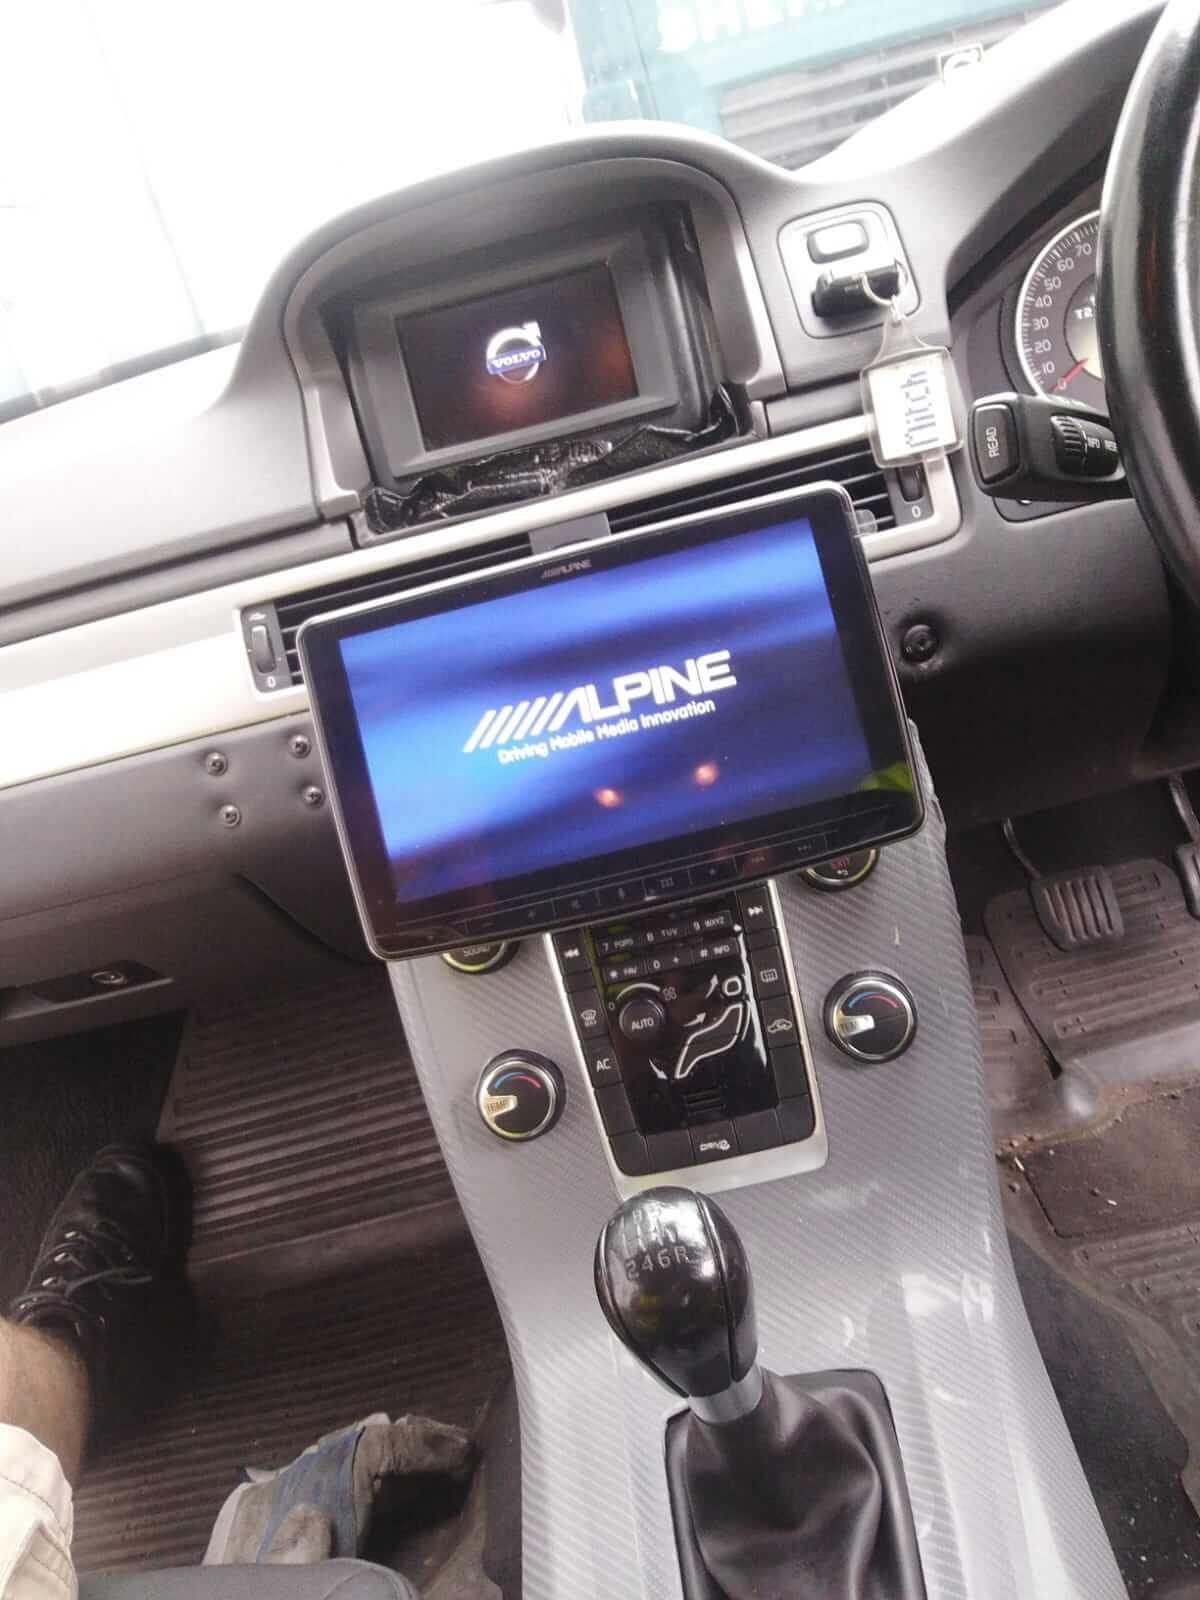 Halo9 into Volvo ex police car2-min